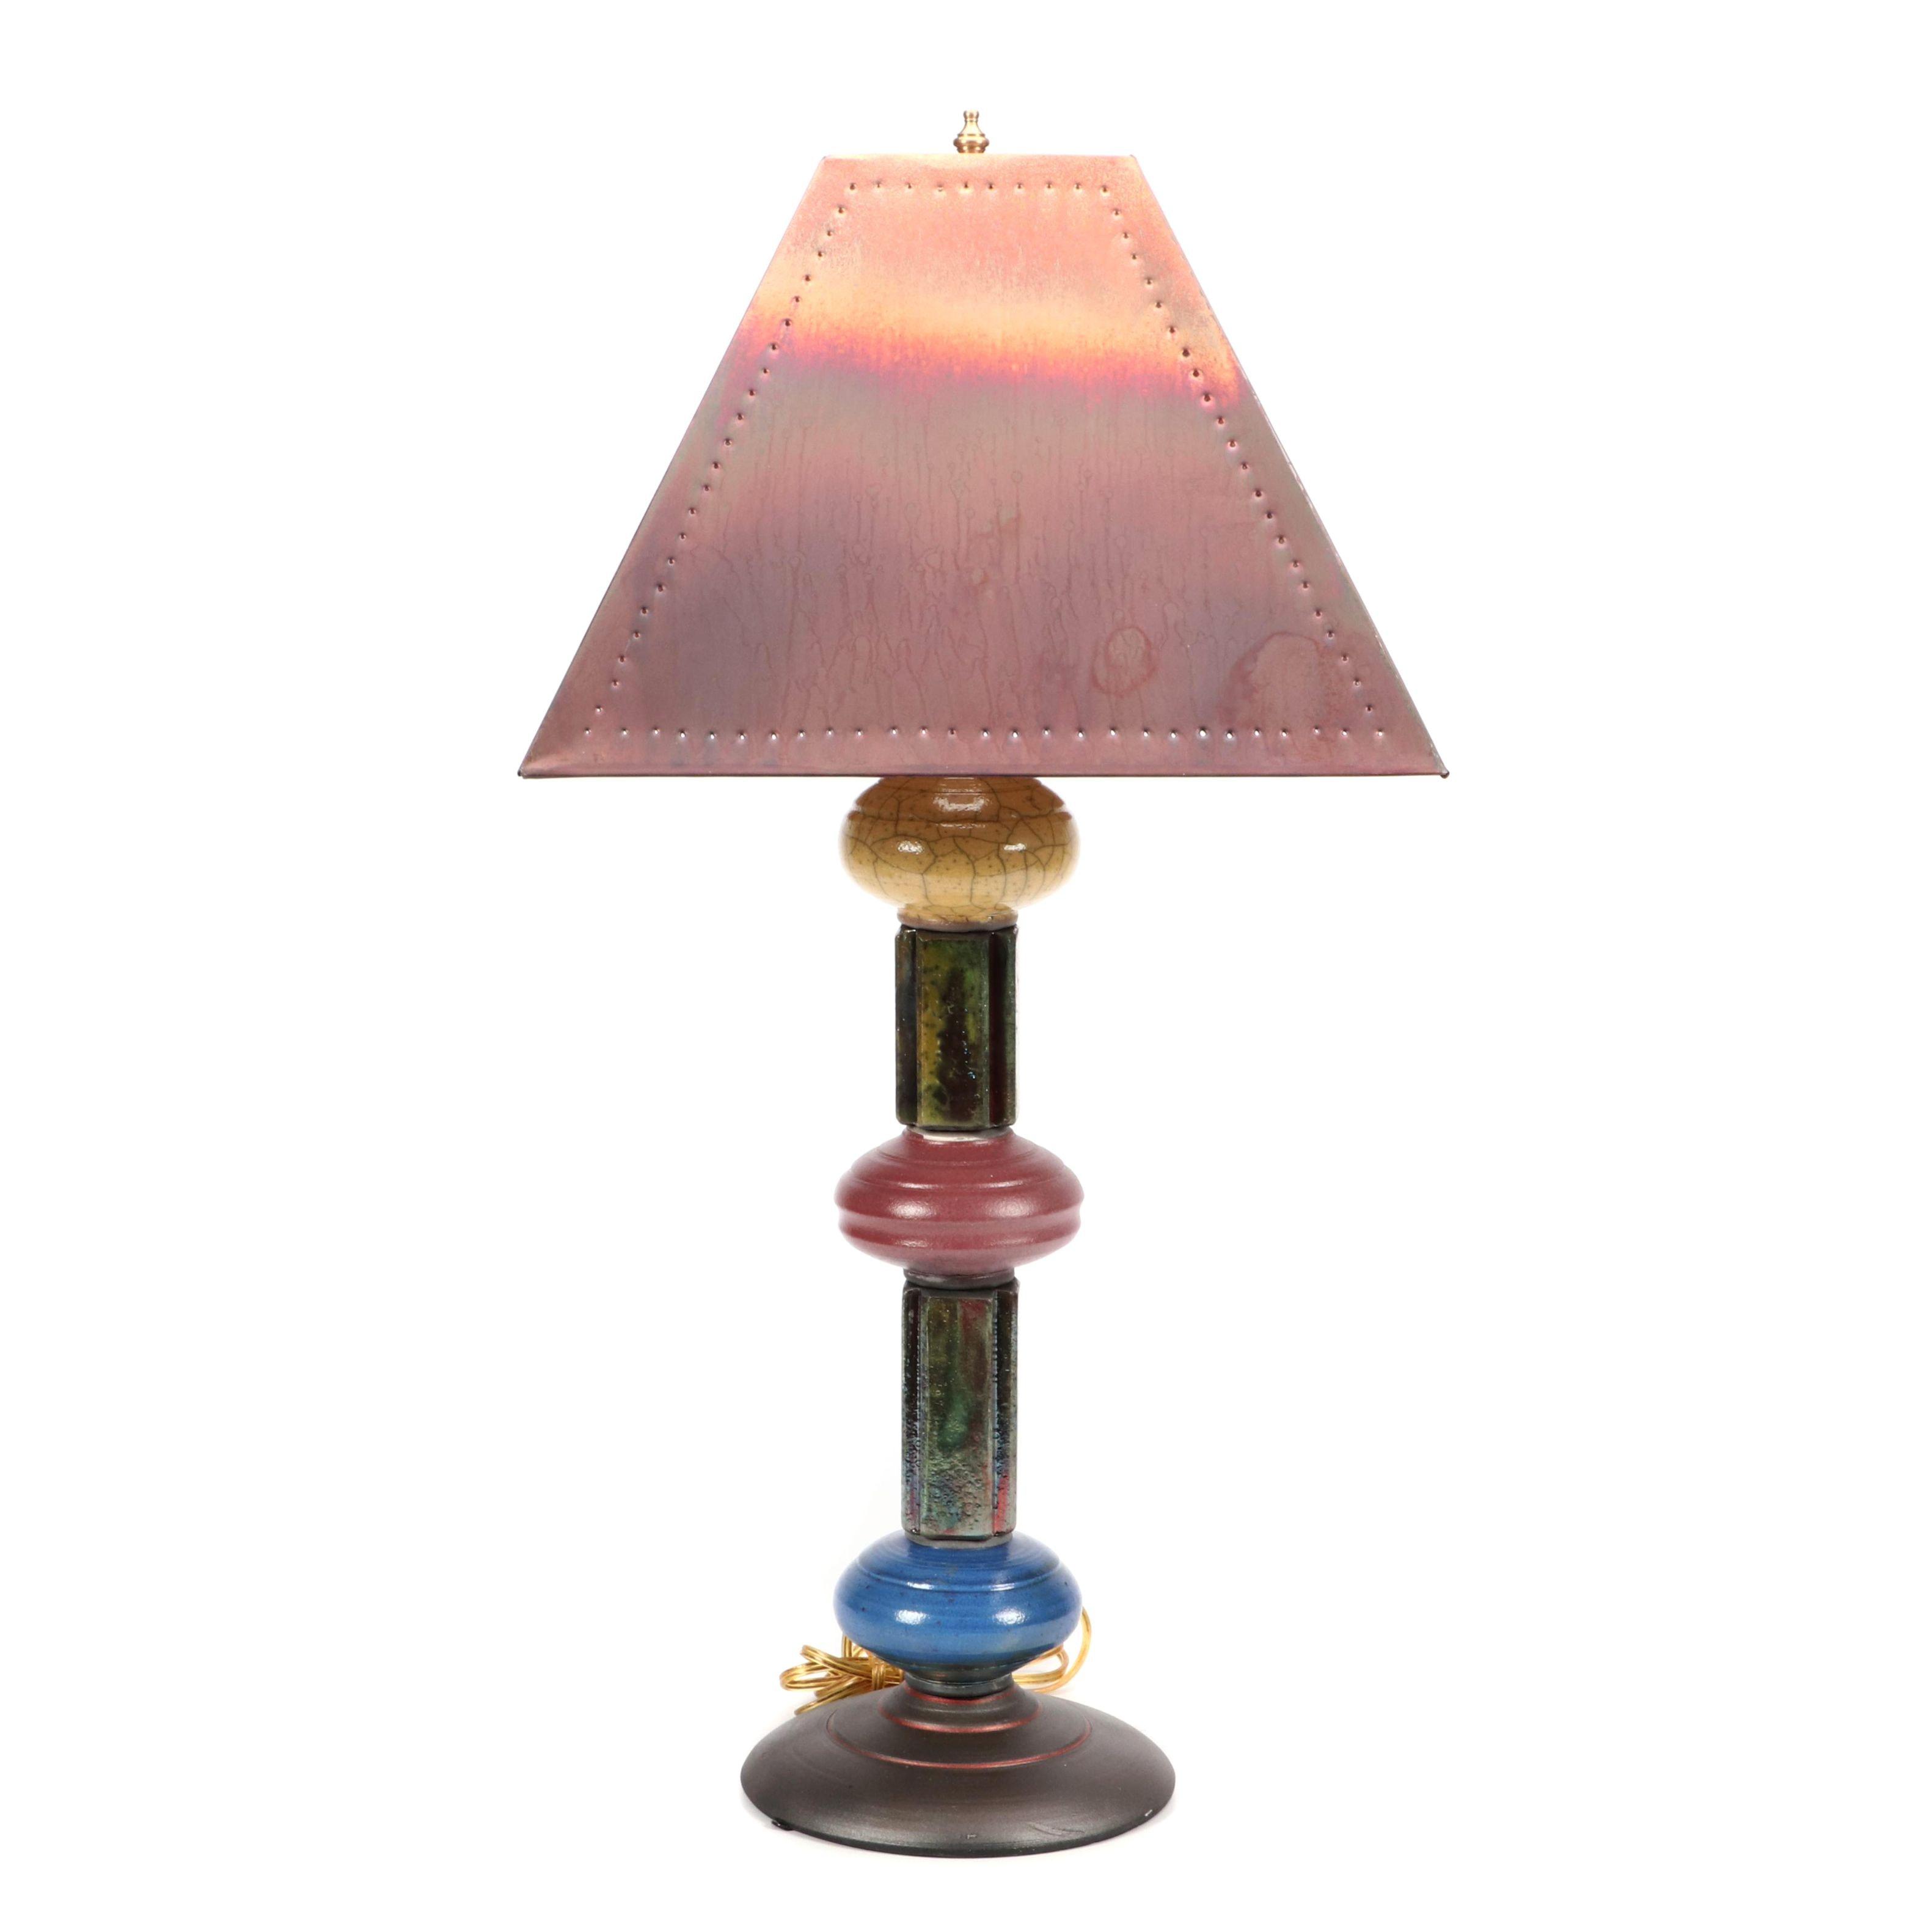 Wheel Thrown Raku Fired Stoneware Table Lamp with Kohler Copper Shade